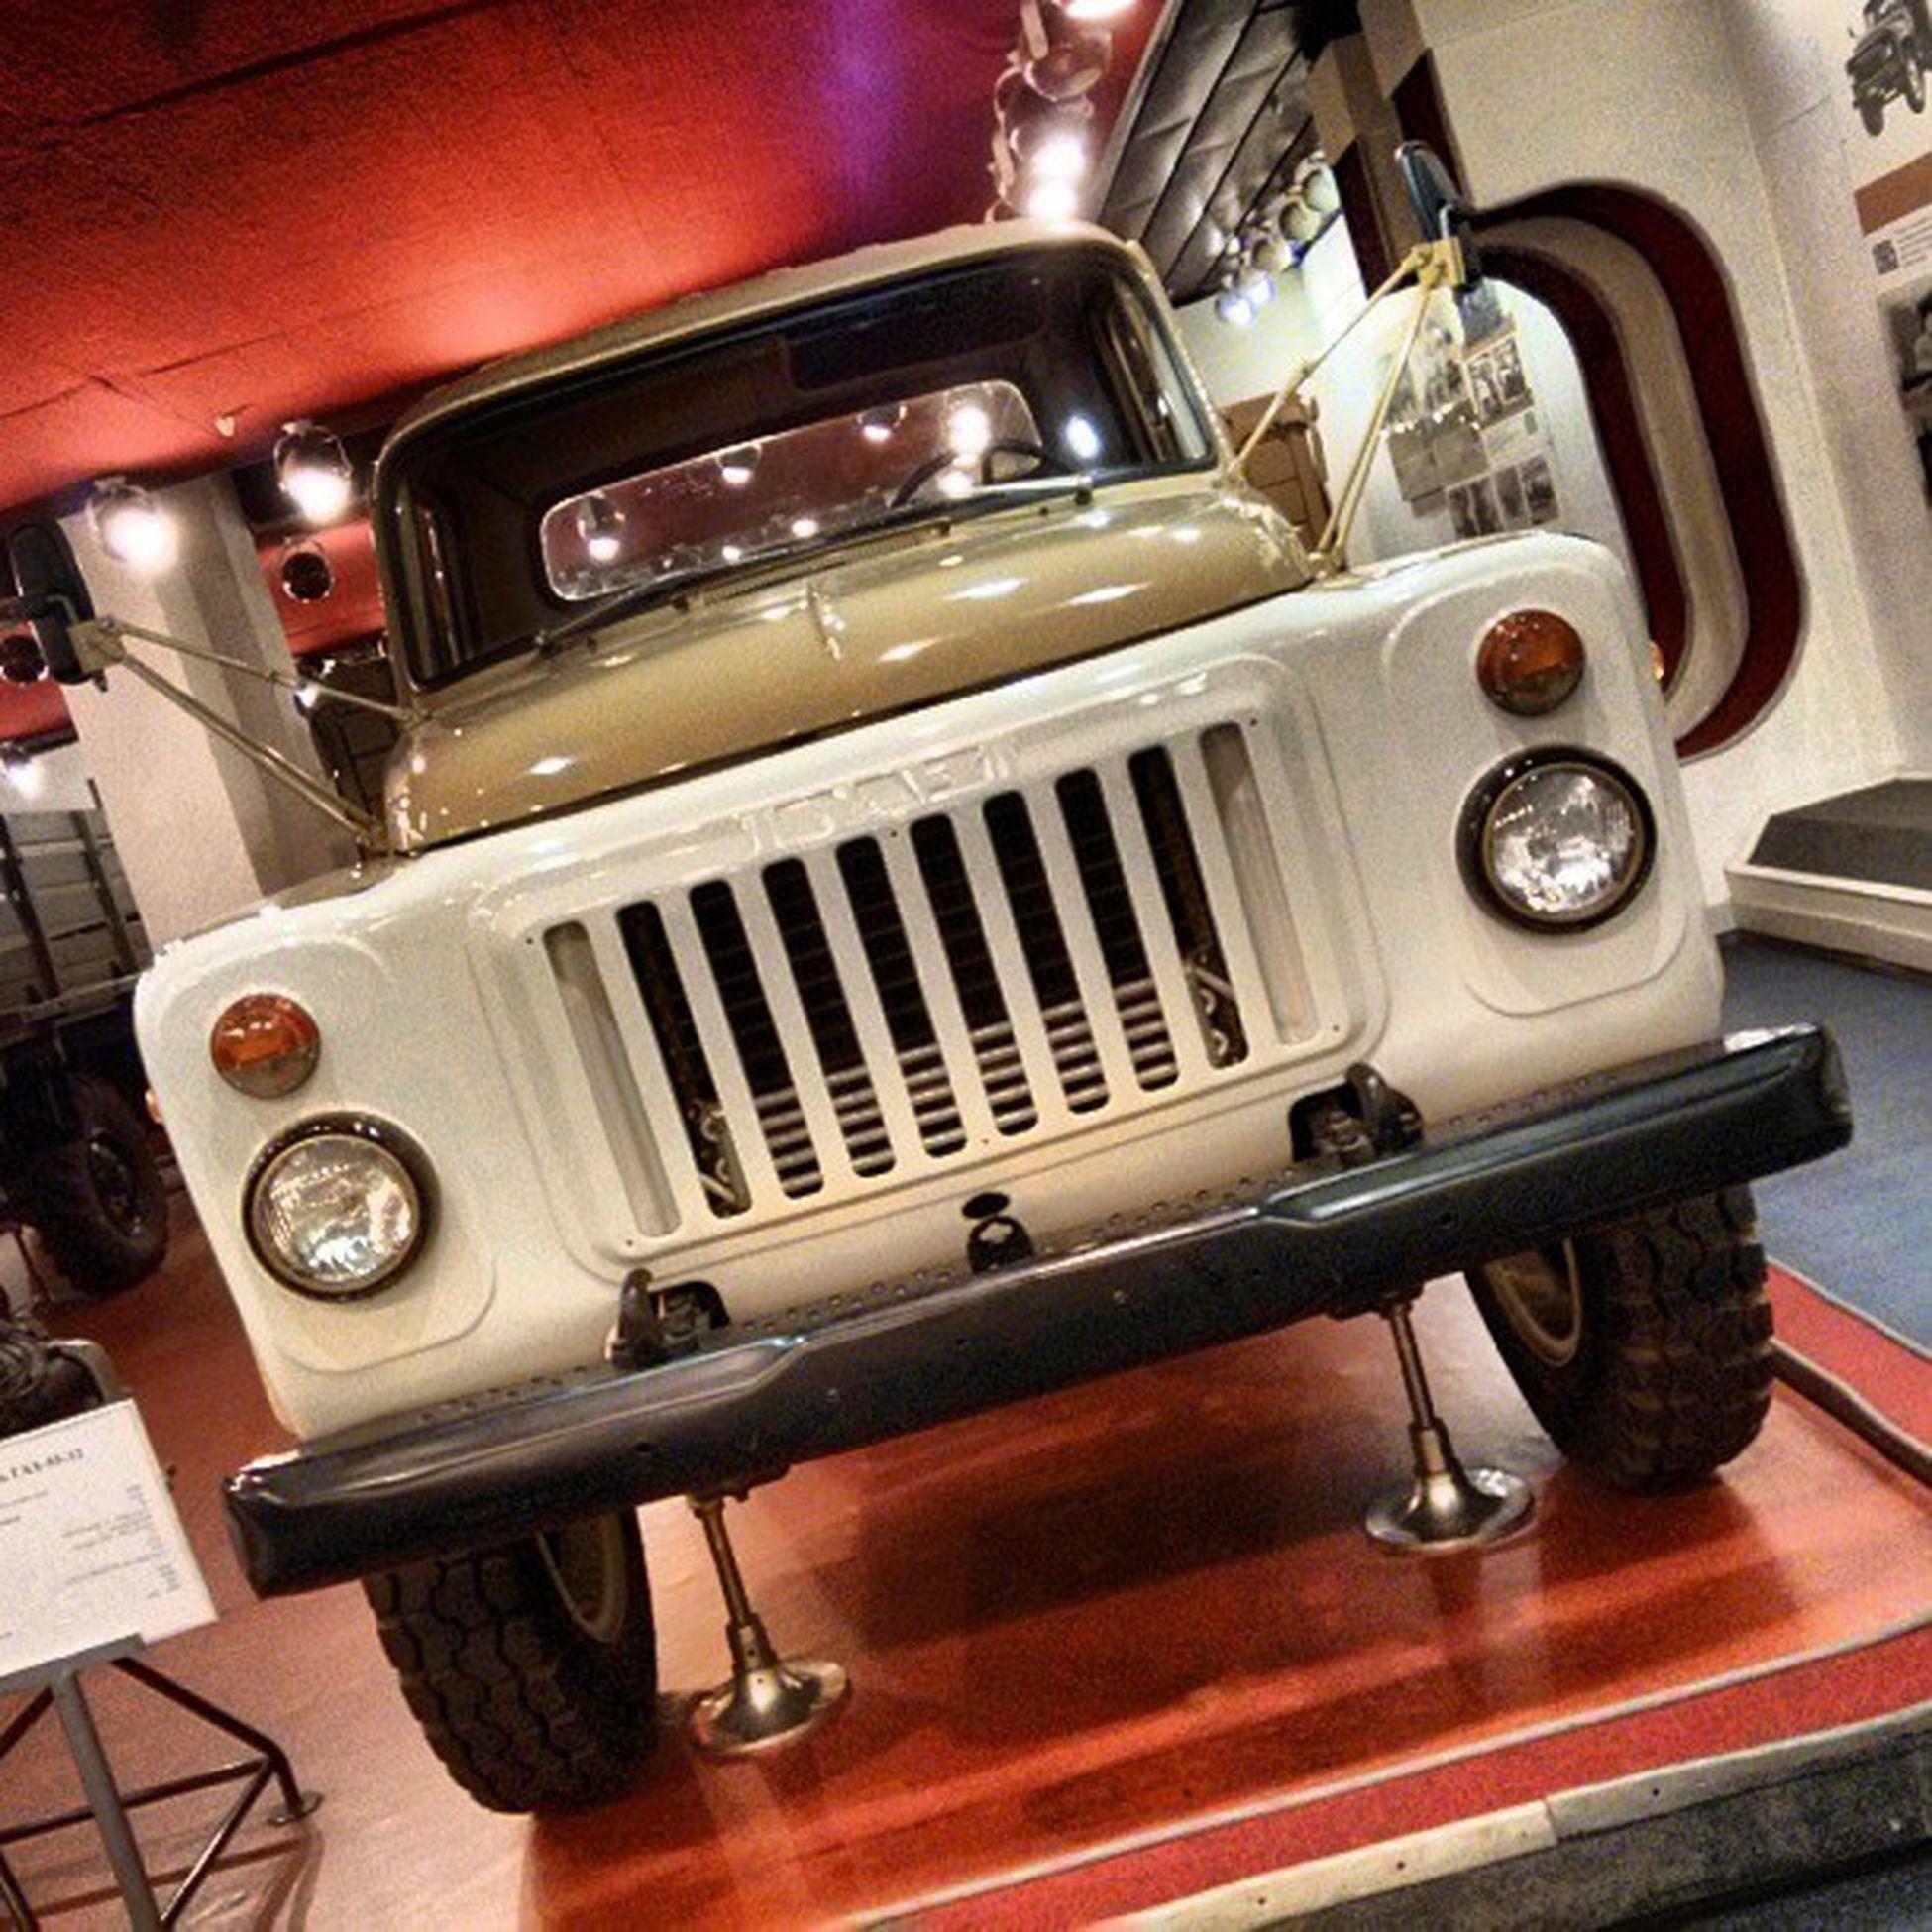 Gaz53 Nn Truck Ussr газон газ53 газ горький музей грузовик нн